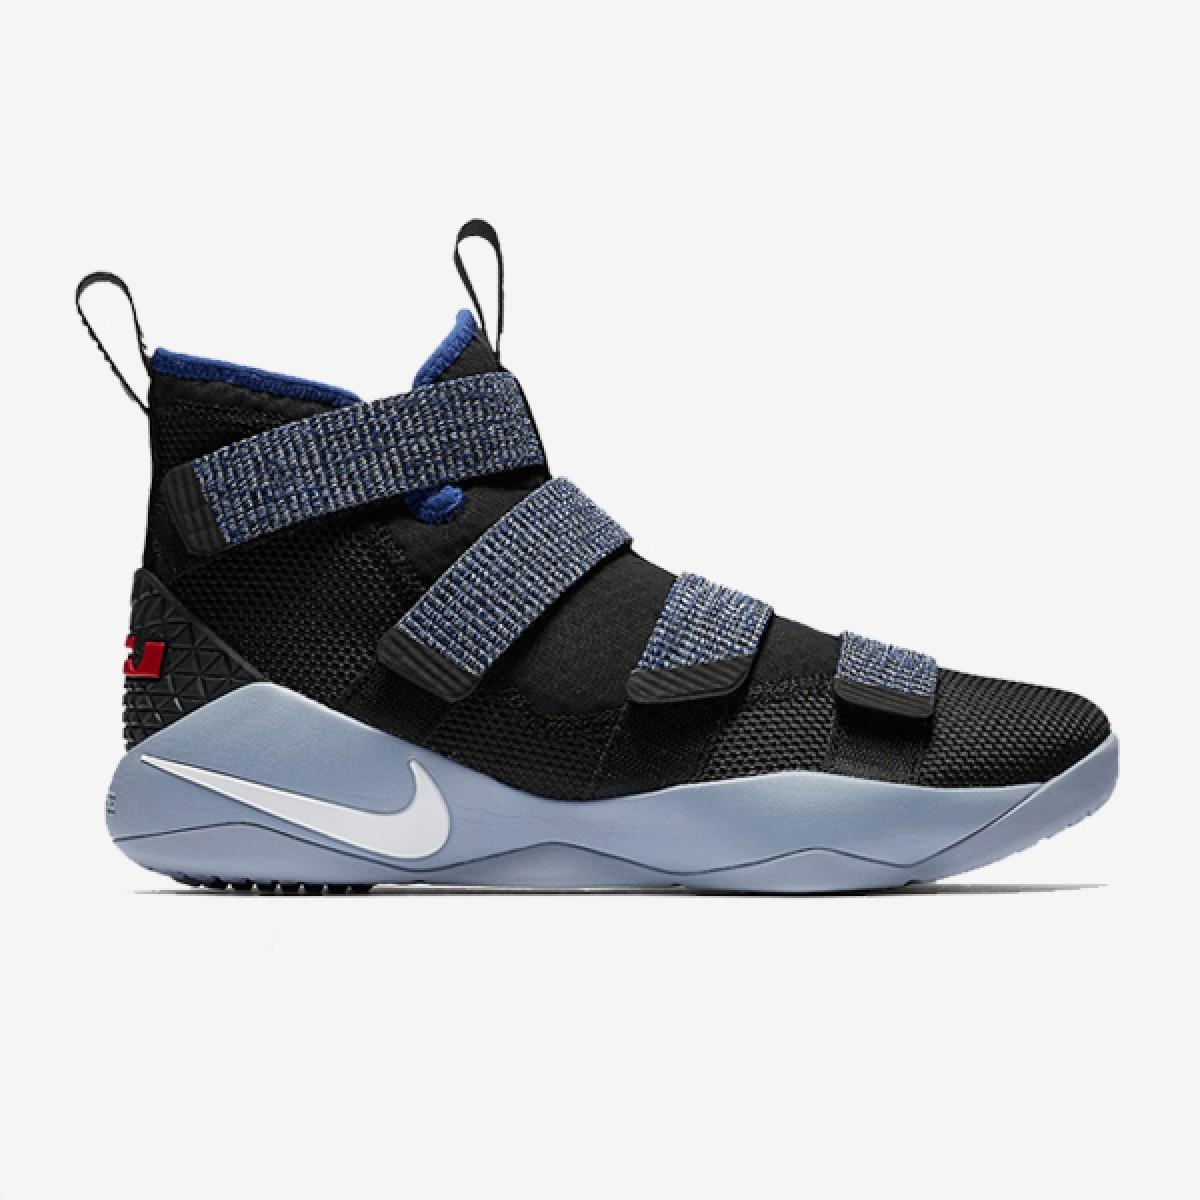 Nike Lebron Soldier XI 'Steel'